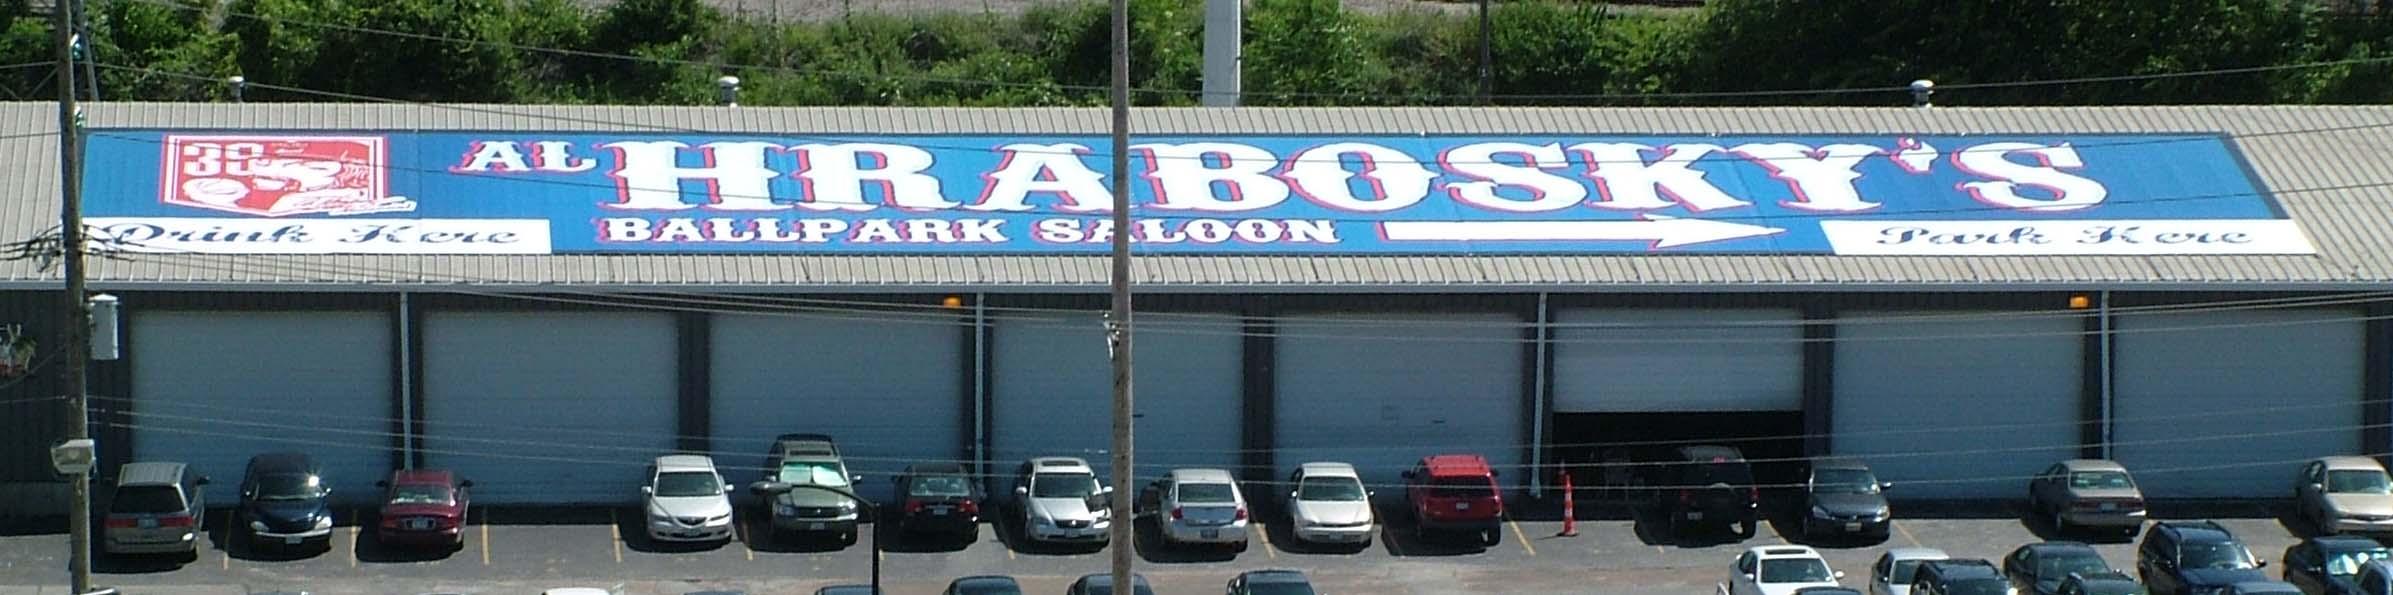 Ballpark Saloon 32x160 Vinyl Flex Banner